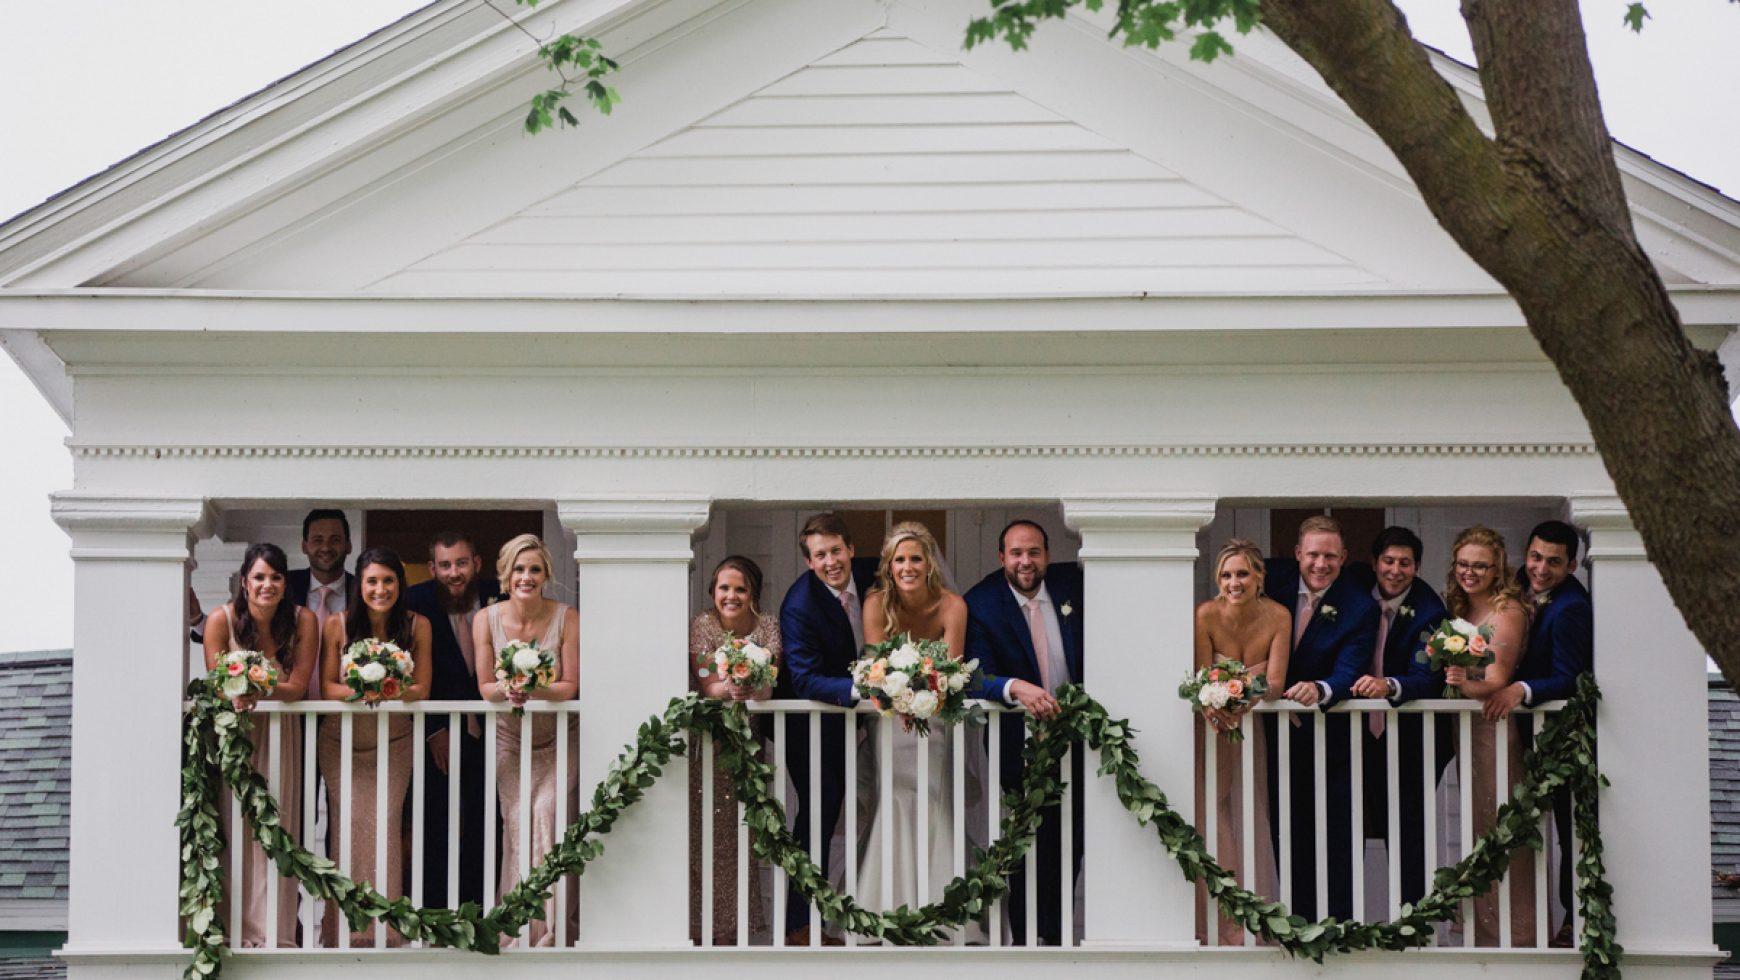 Saying Thanks: Wedding Party Gift Ideas